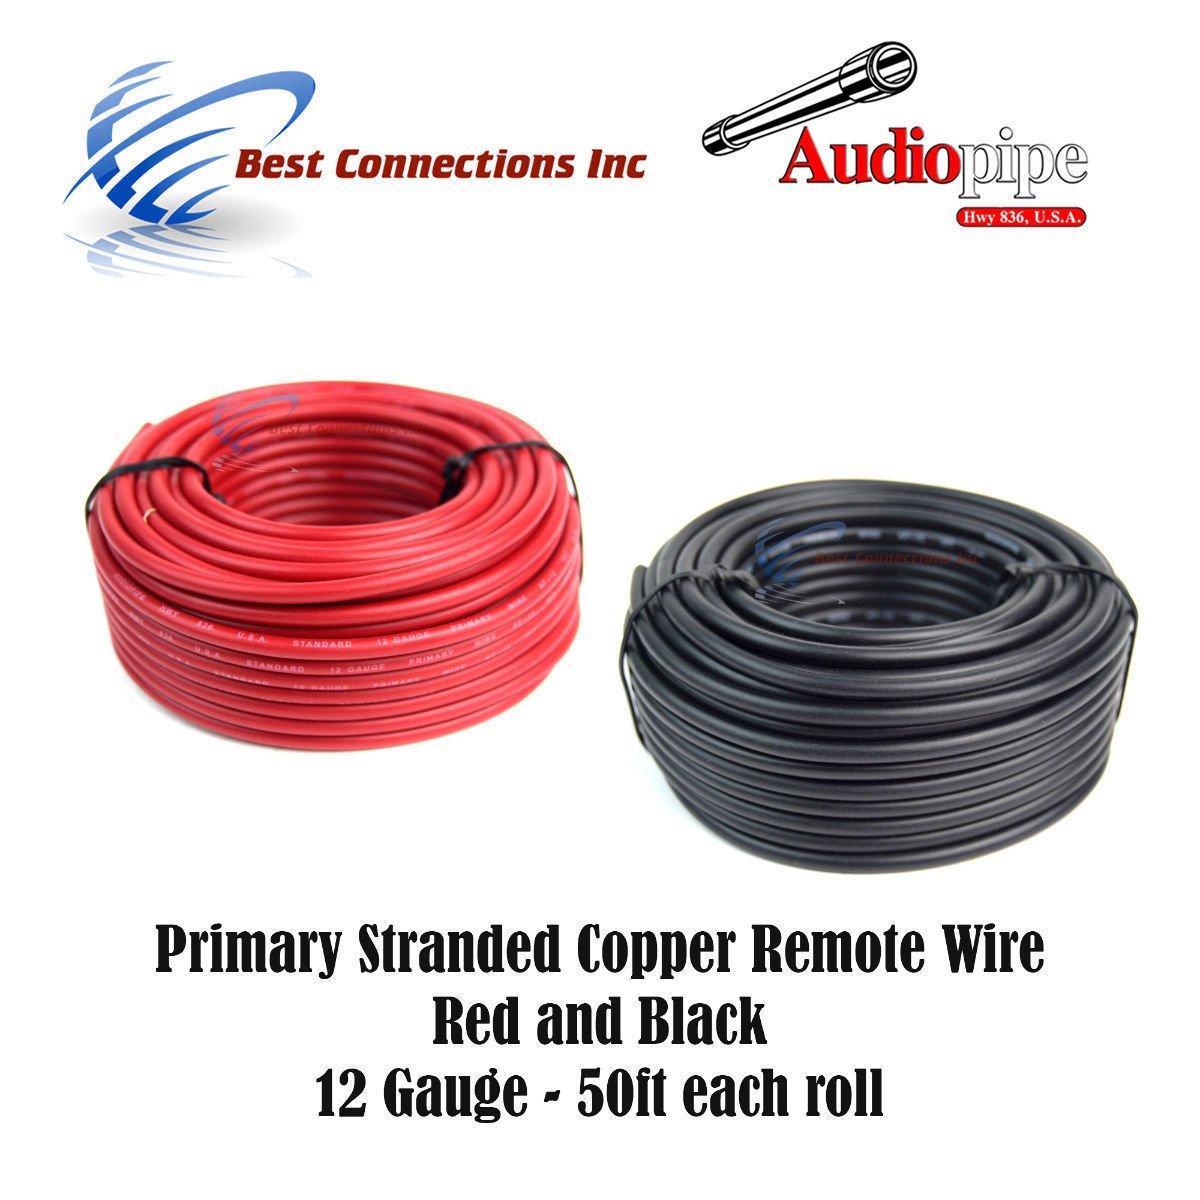 Amazon.com: 12 GAUGE WIRE RED & BLACK POWER GROUND 50 FT EACH ...